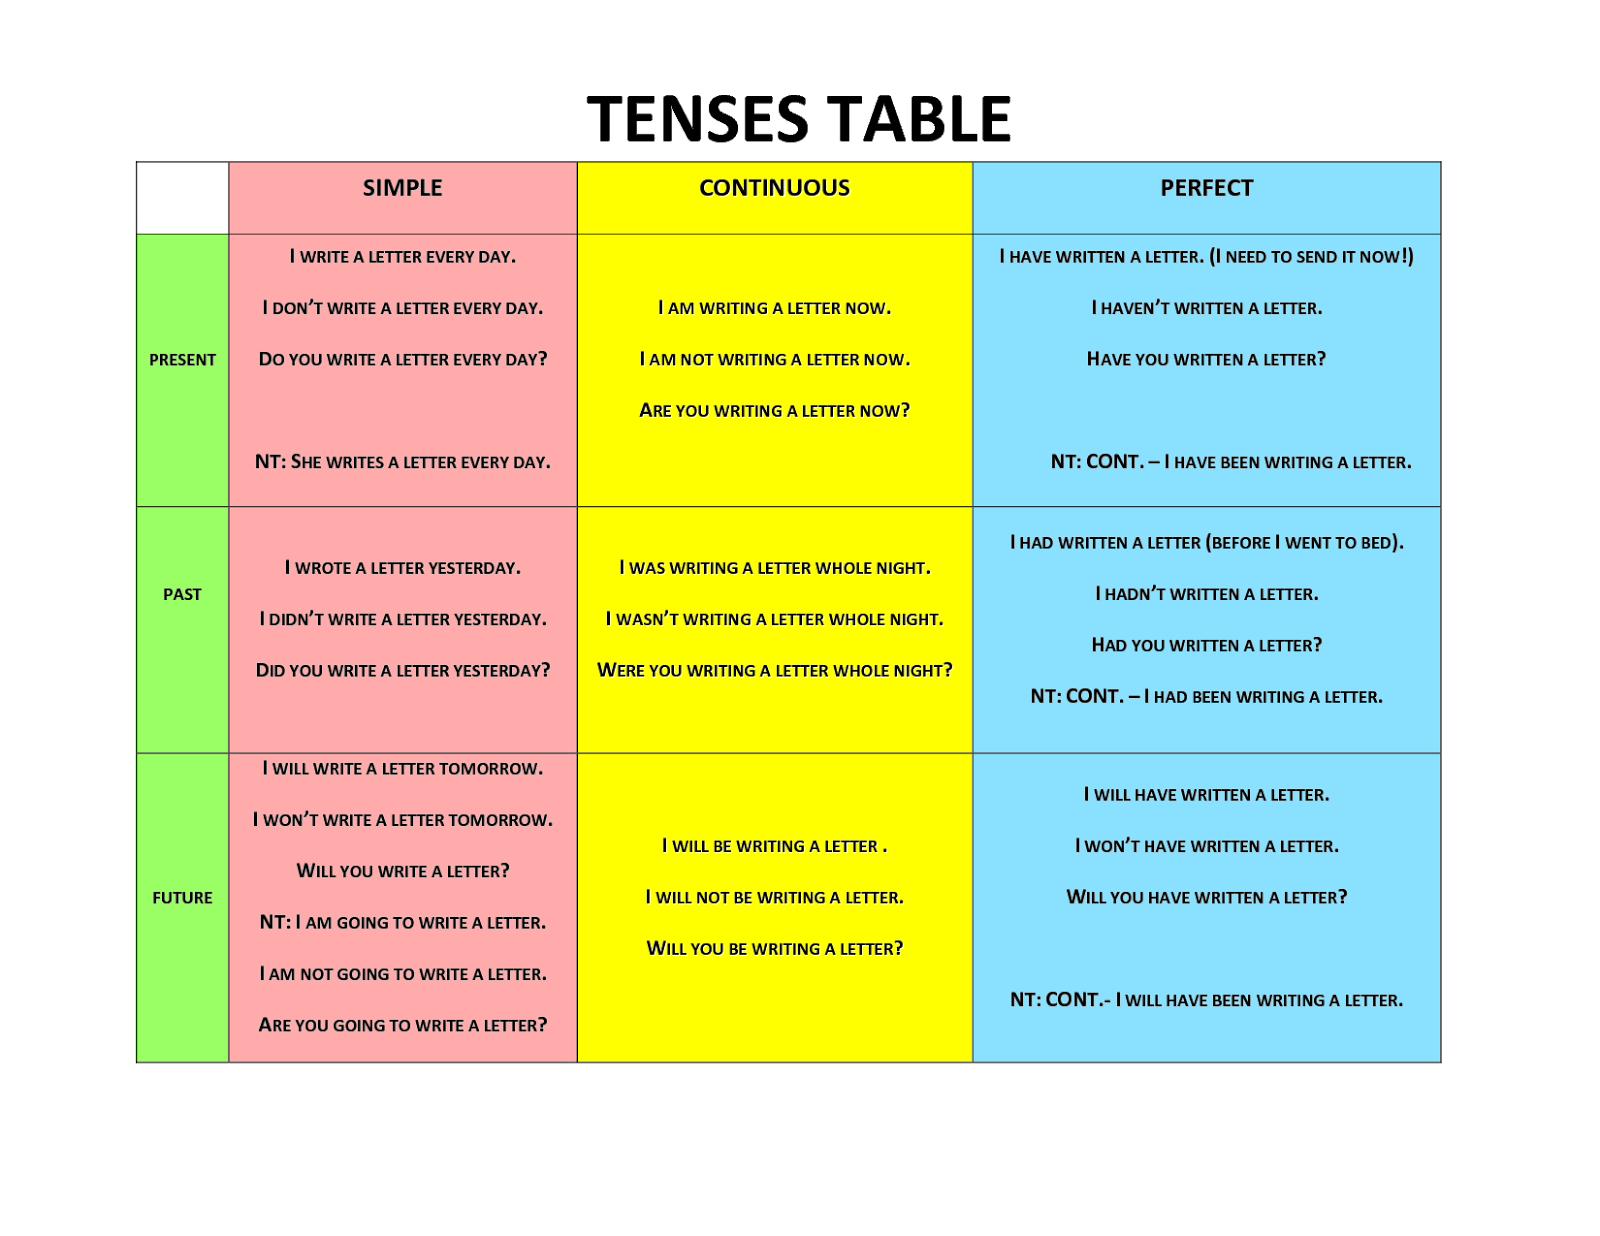 english grammar tense chart: Easy tense chart verb tense and aspect 2015 secondary 4 express